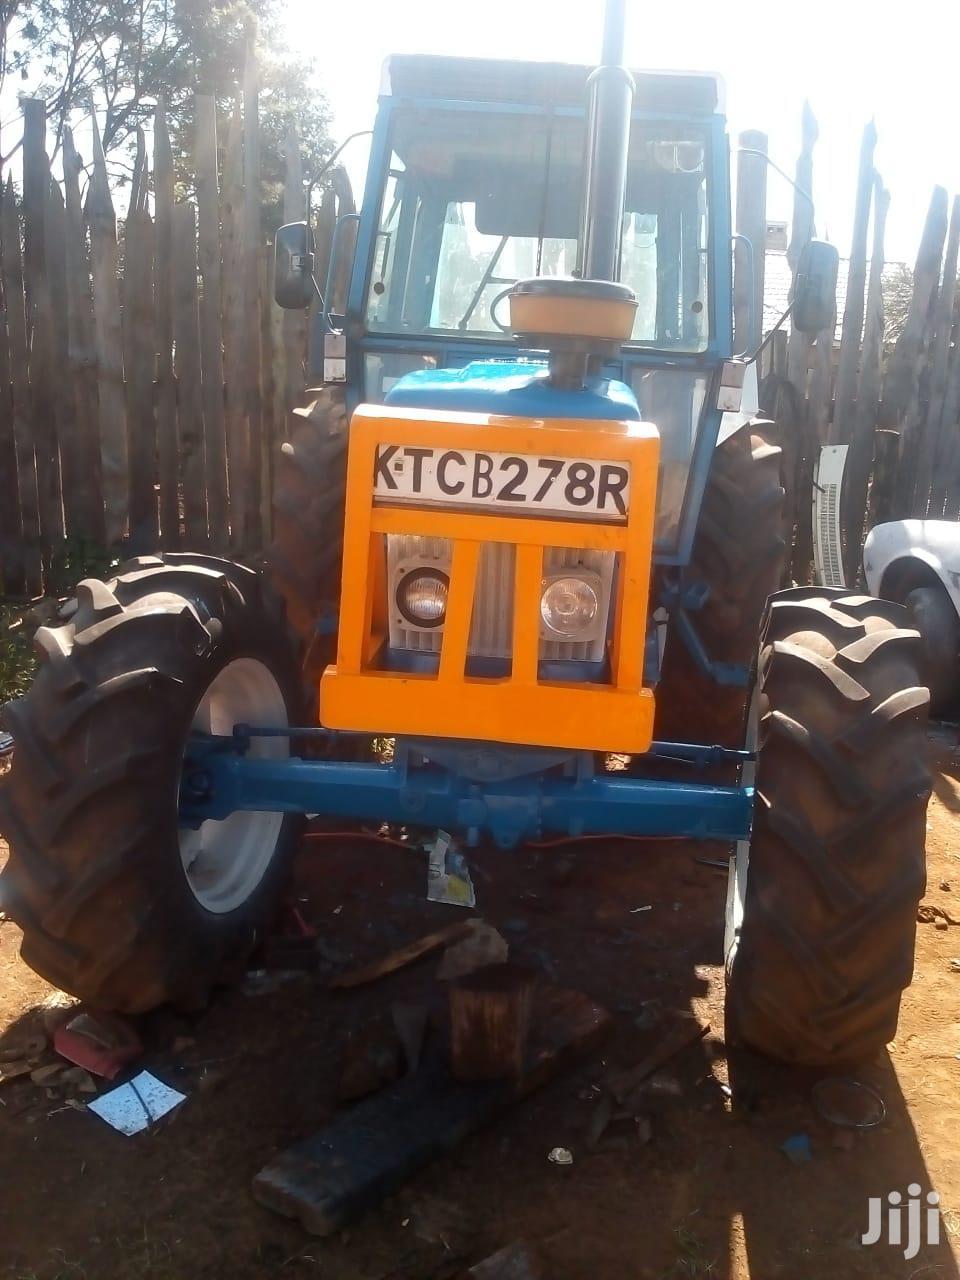 EX UK Ford 7610 Tractor | Heavy Equipment for sale in Kamariny, Elgeyo-Marakwet, Kenya